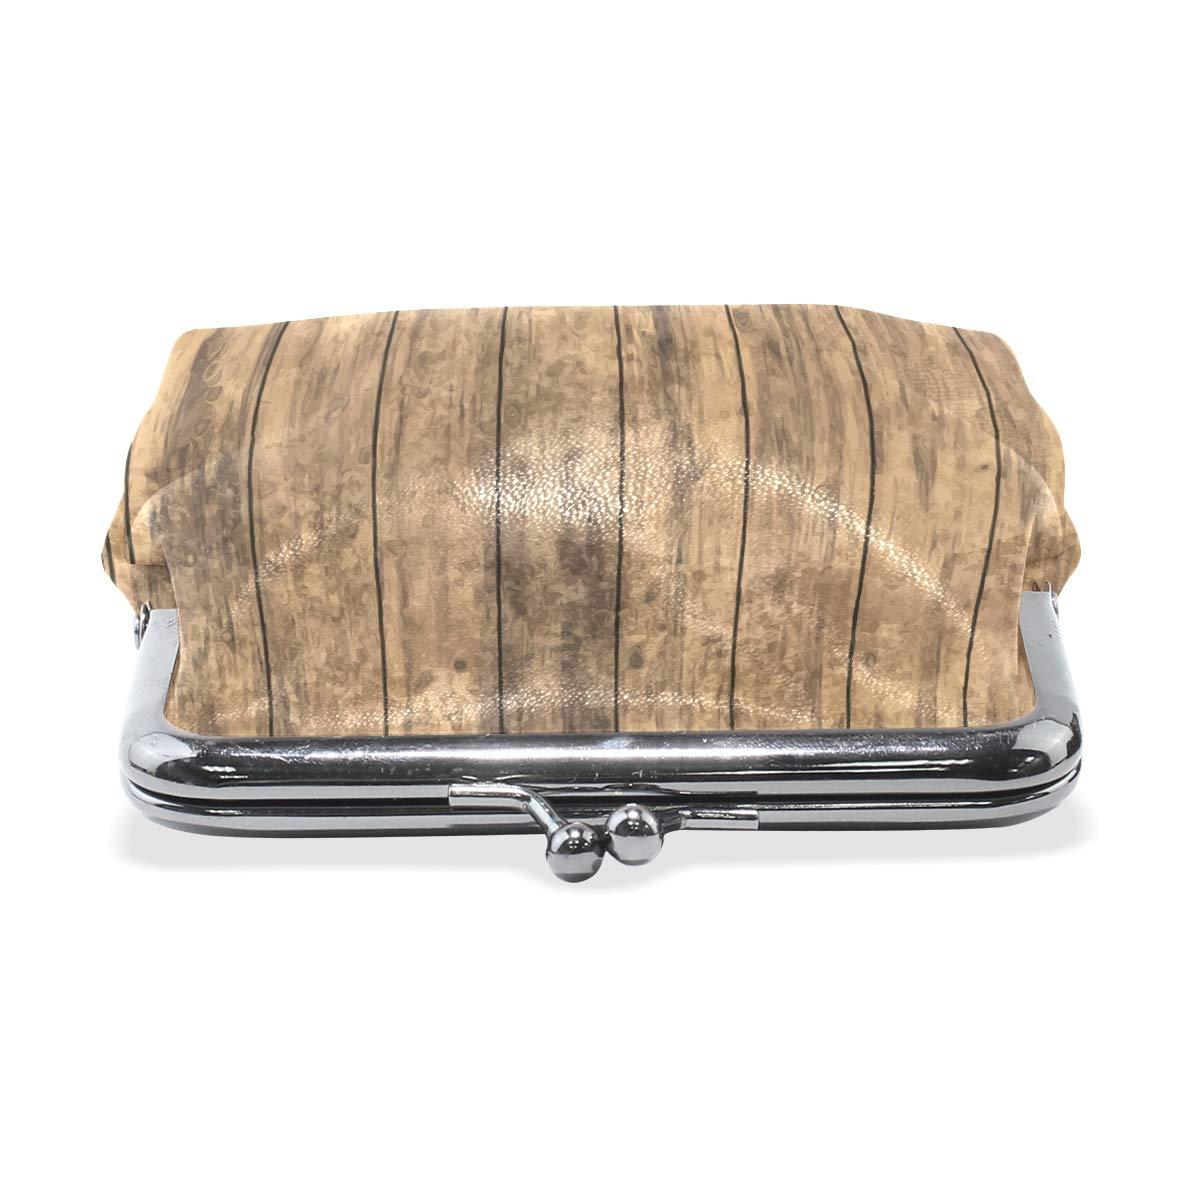 Women Wallet Purse Vintage Old Wooden Floor Clutch Bag Leather